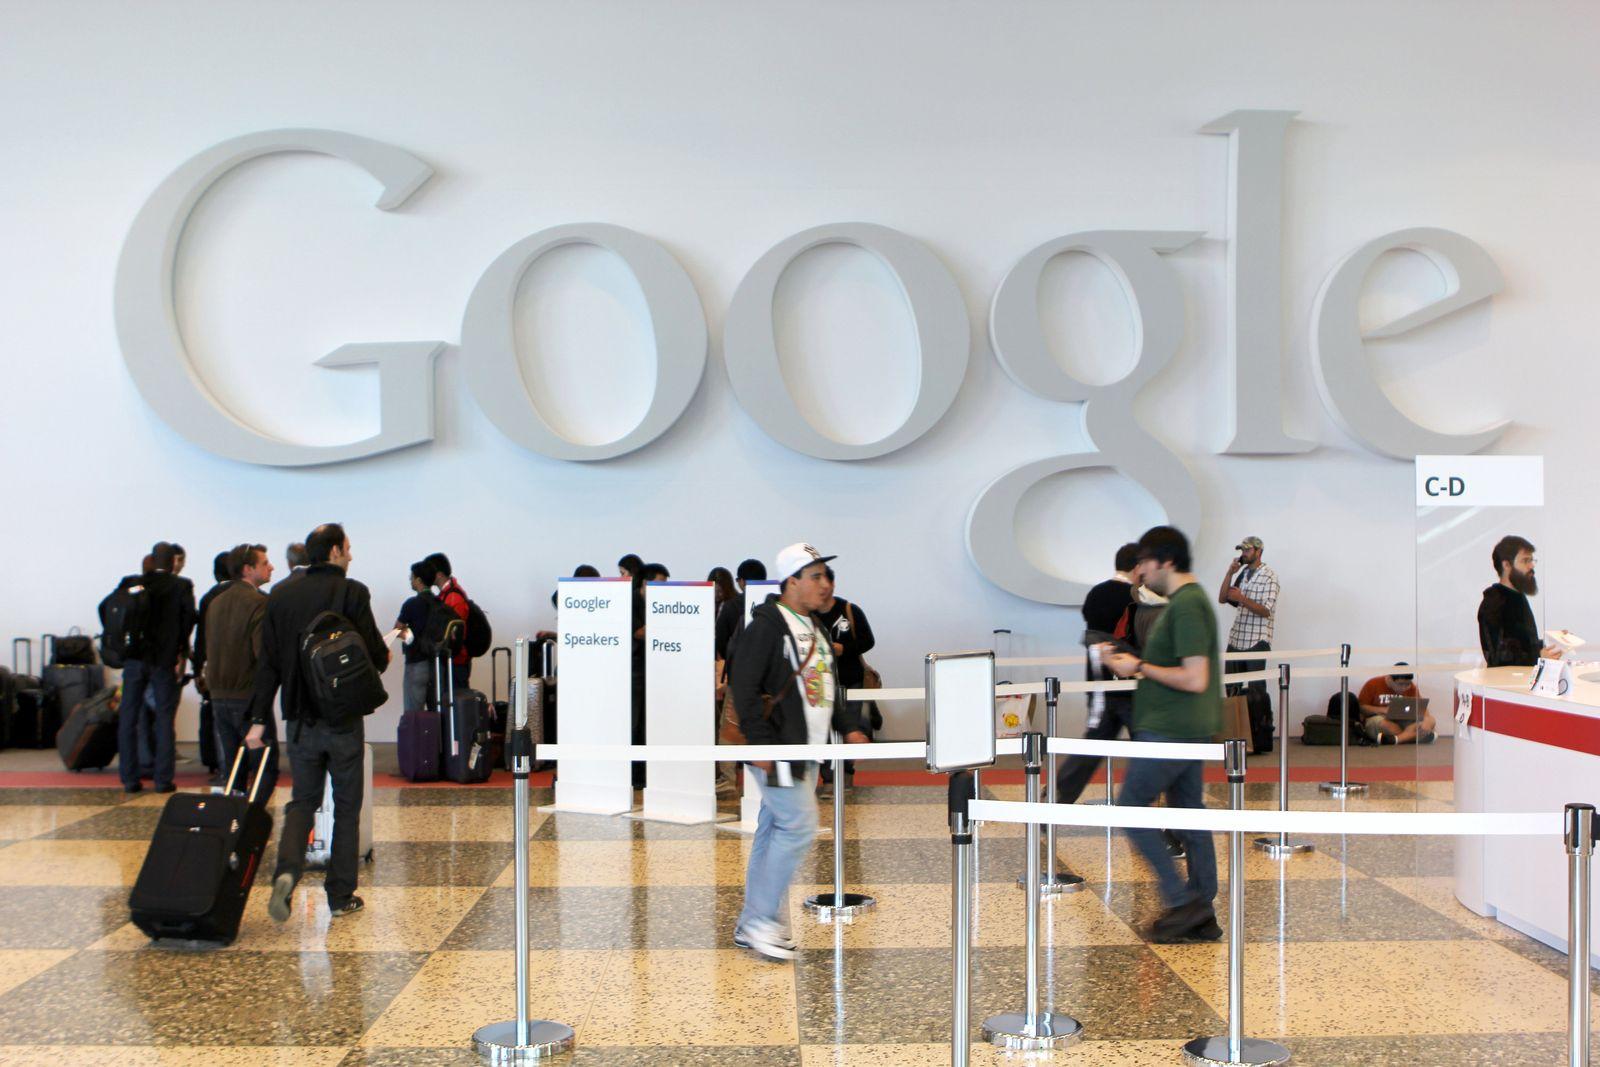 Entwicklermesse Google I/O 2013